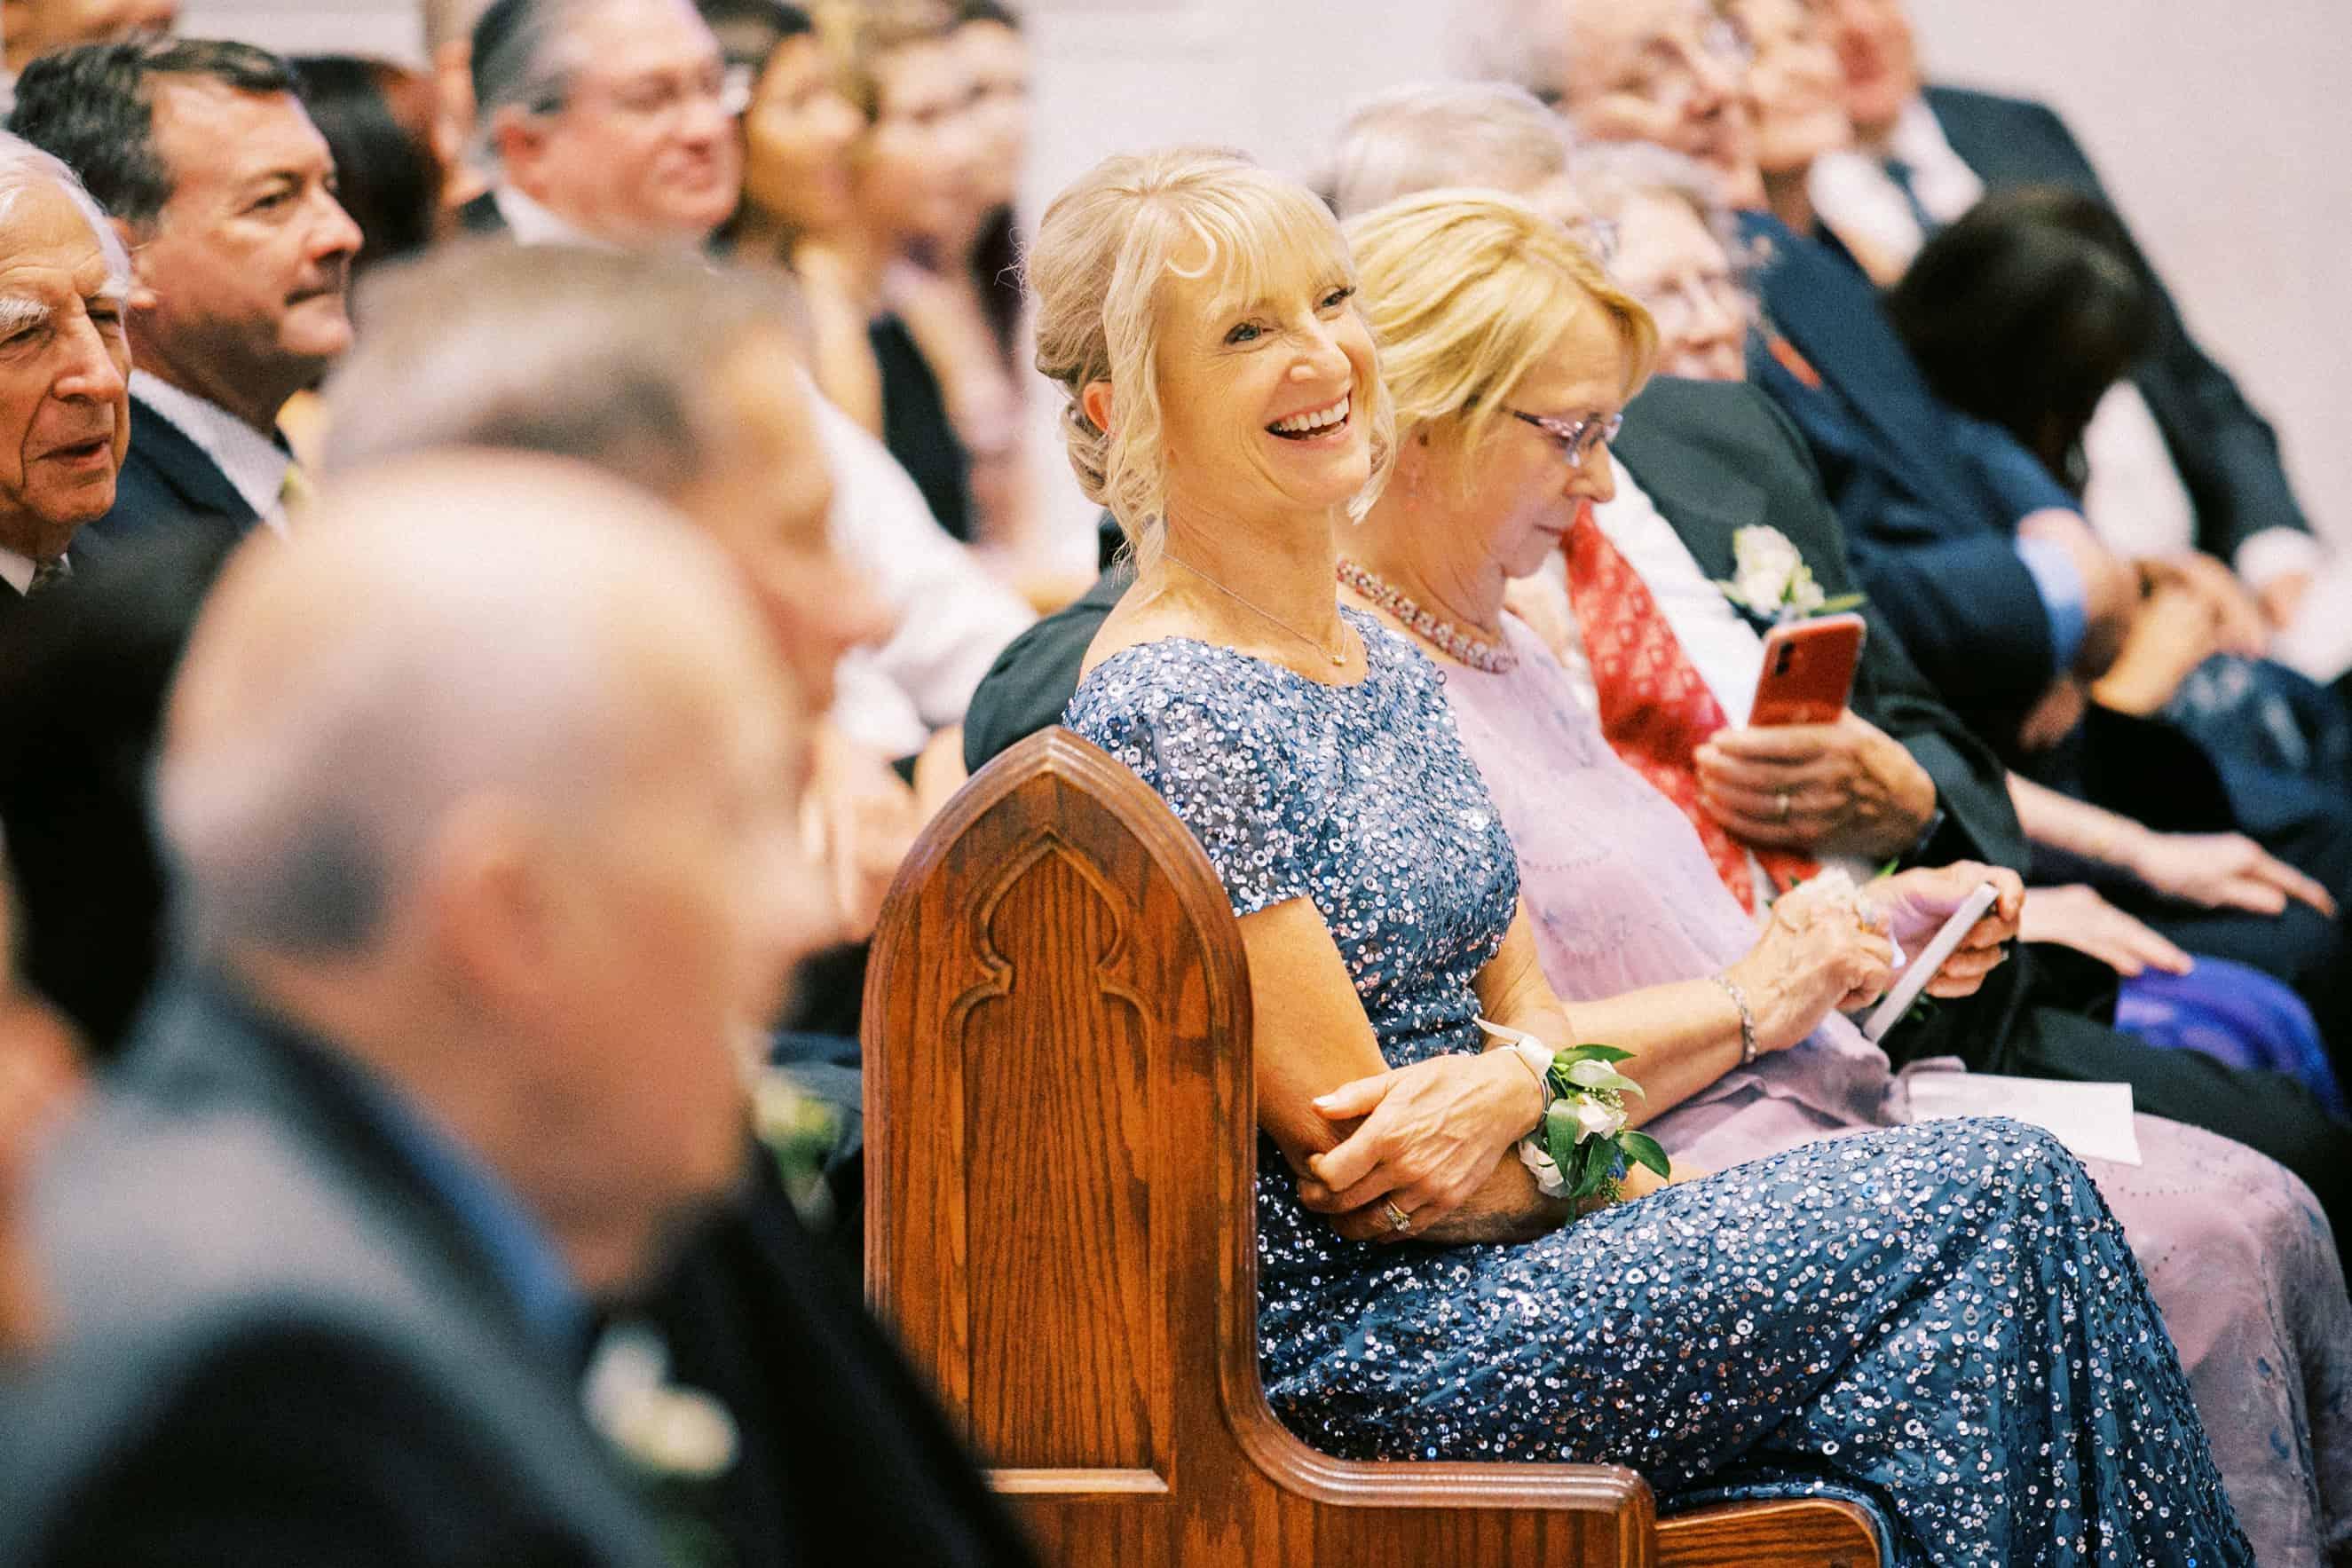 Wedding ceremonies Villanova University